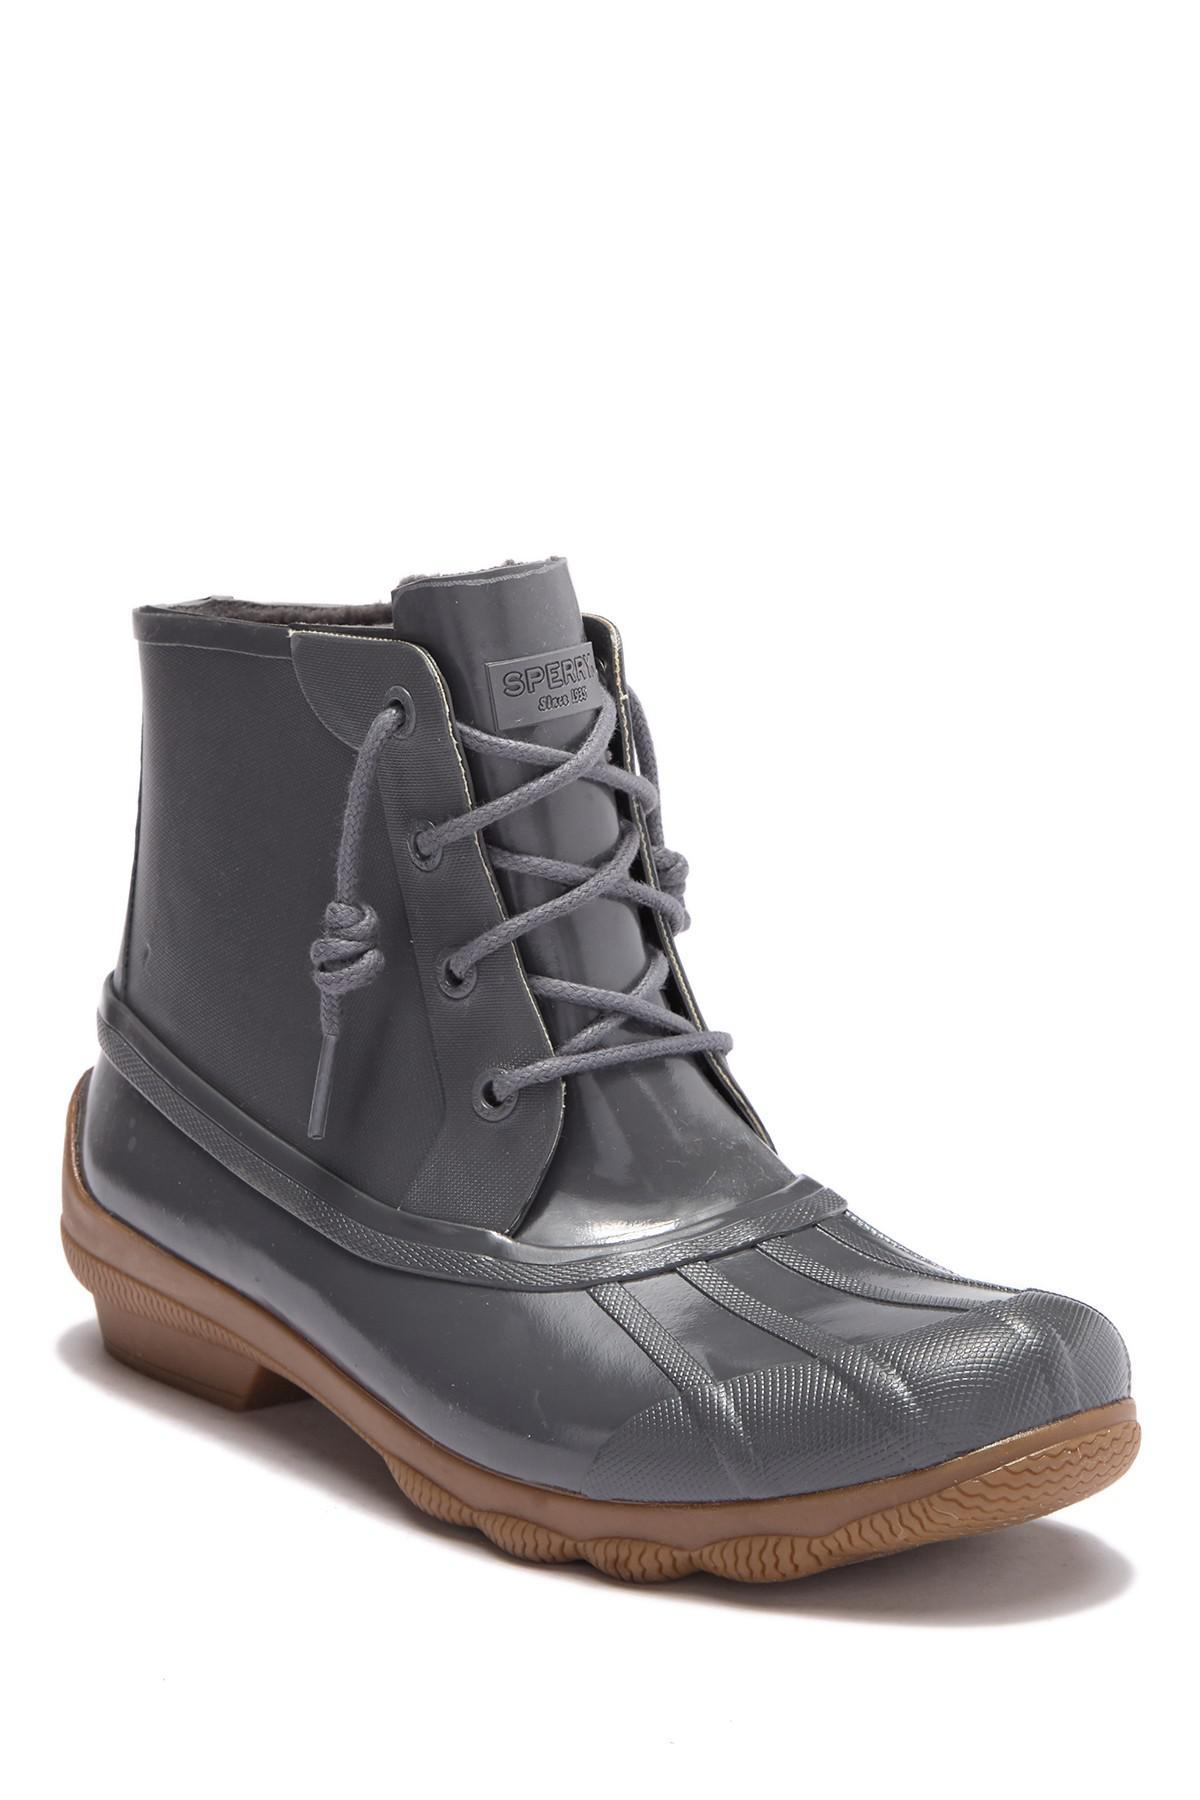 348466b6f930 Lyst - Sperry Top-Sider Syren Gulf Waterproof Duck Boot in Gray